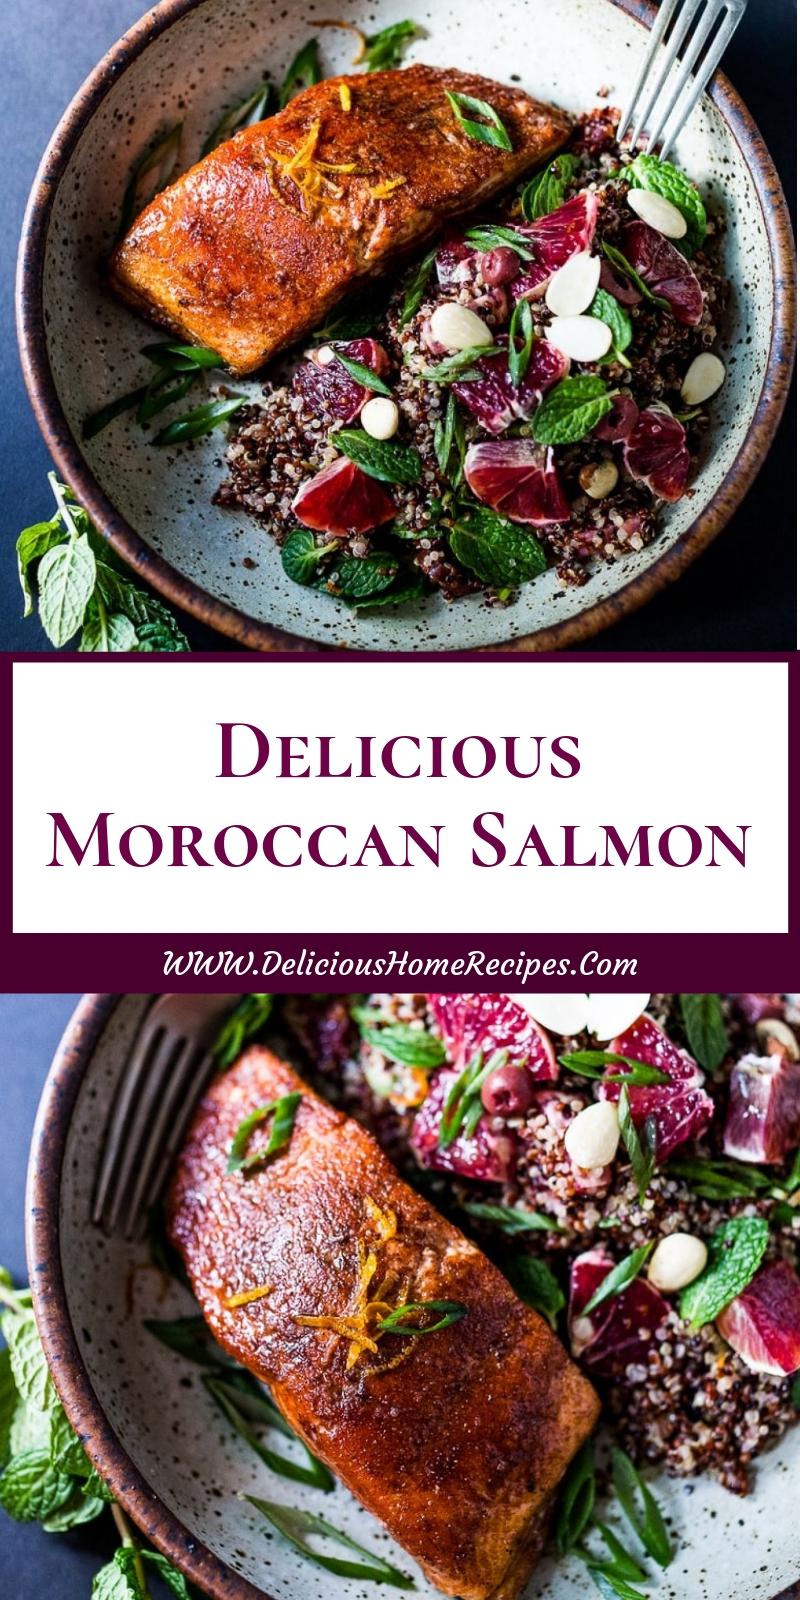 Delicious Moroccan Salmon